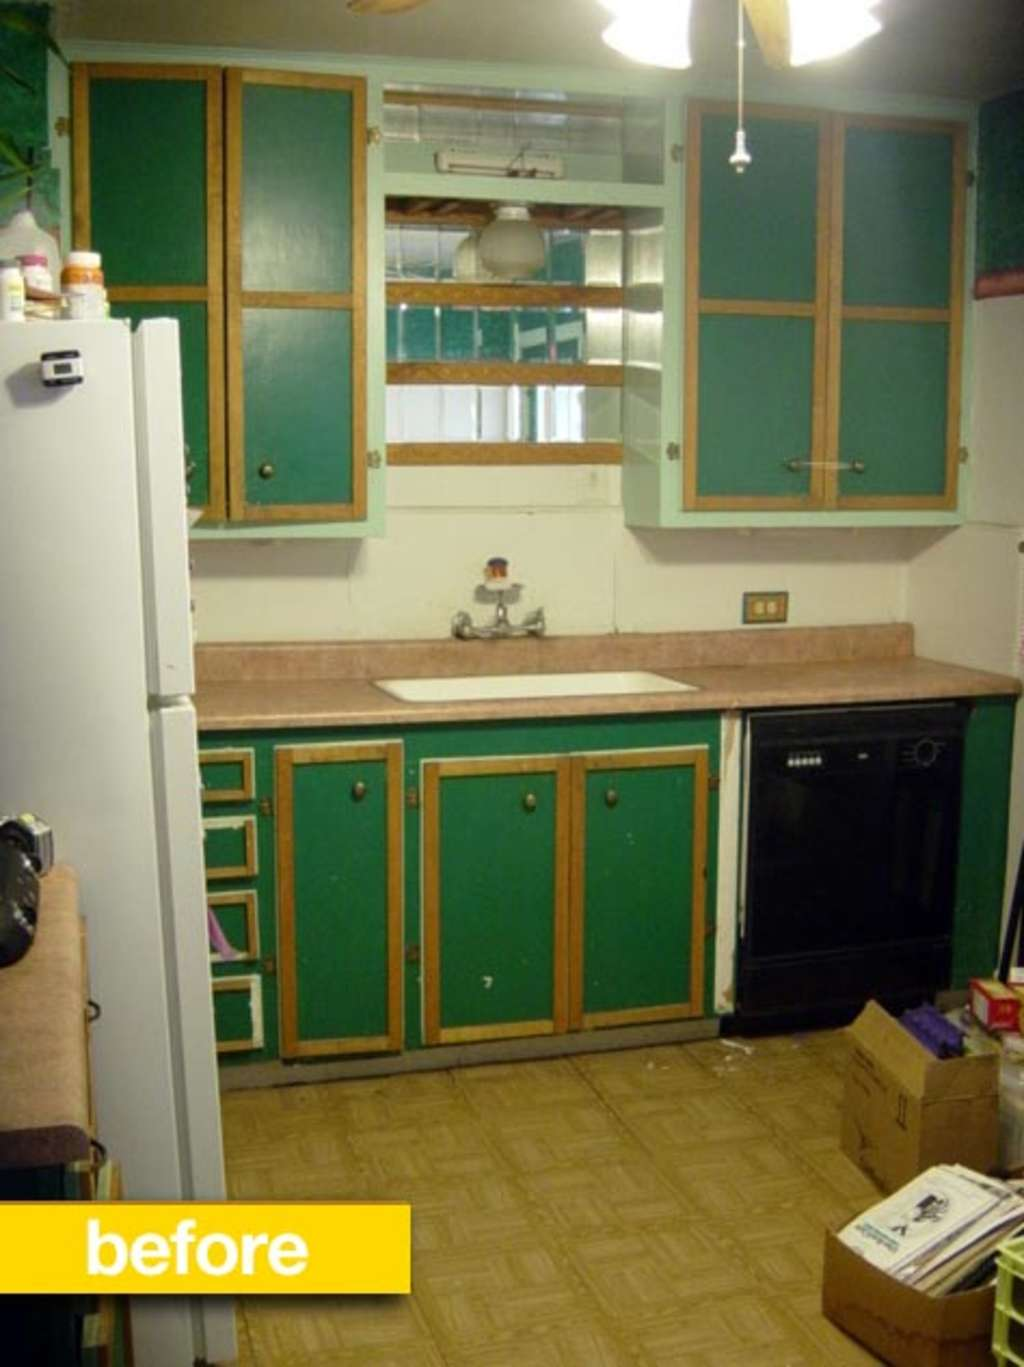 kitchen before after cheryl 39 s 39 very tight budget 39 diy redo kitchn. Black Bedroom Furniture Sets. Home Design Ideas